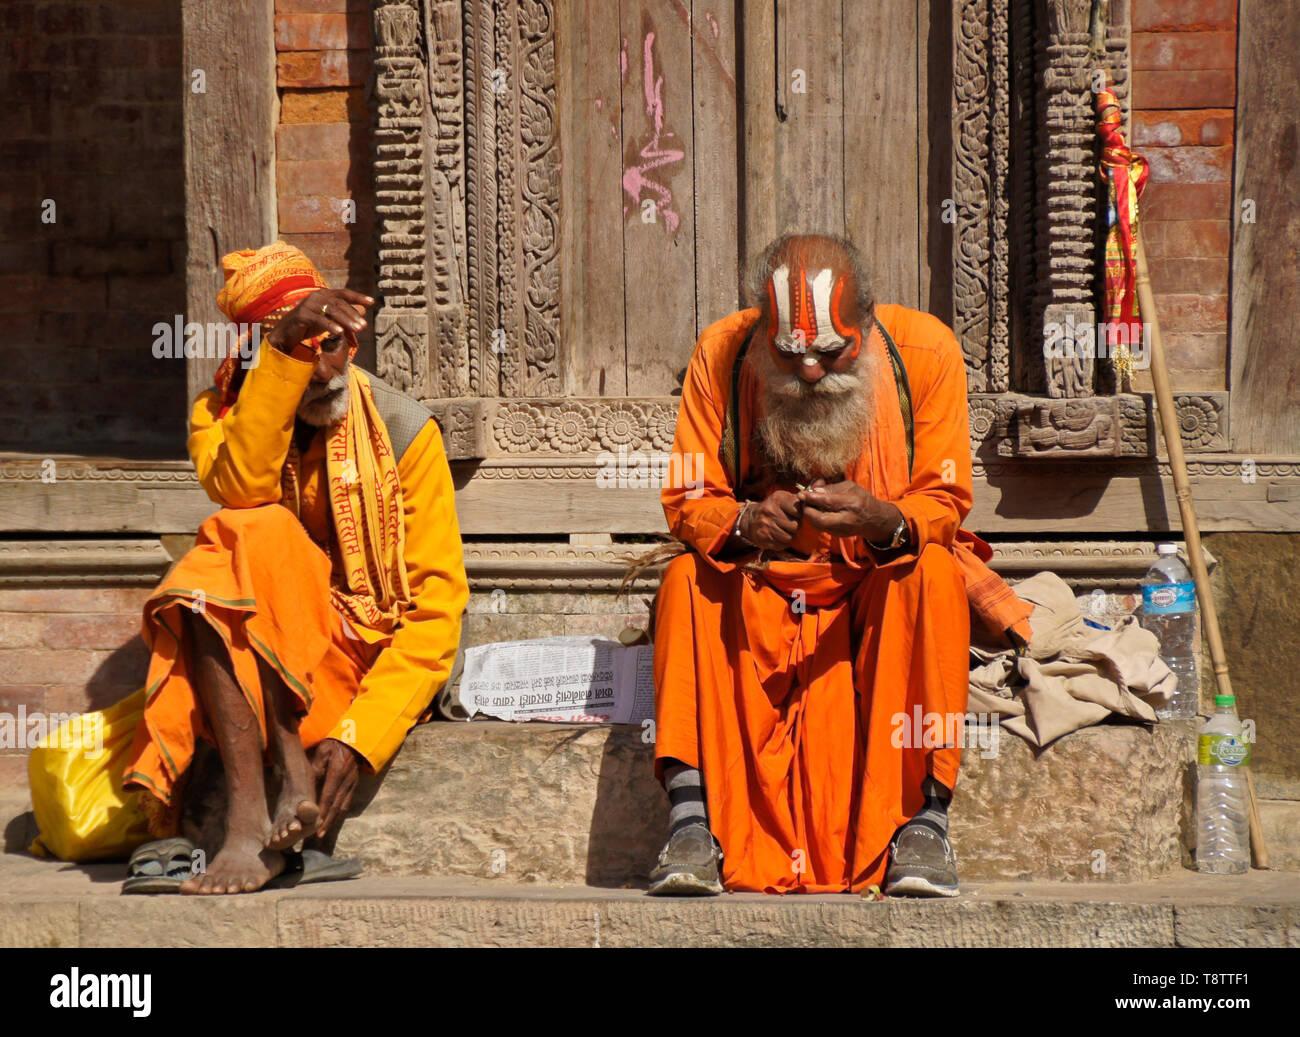 Hindu sadhus (holy men) sitting on the steps of a building in Durbar Square, Kathmandu, Nepal - Stock Image